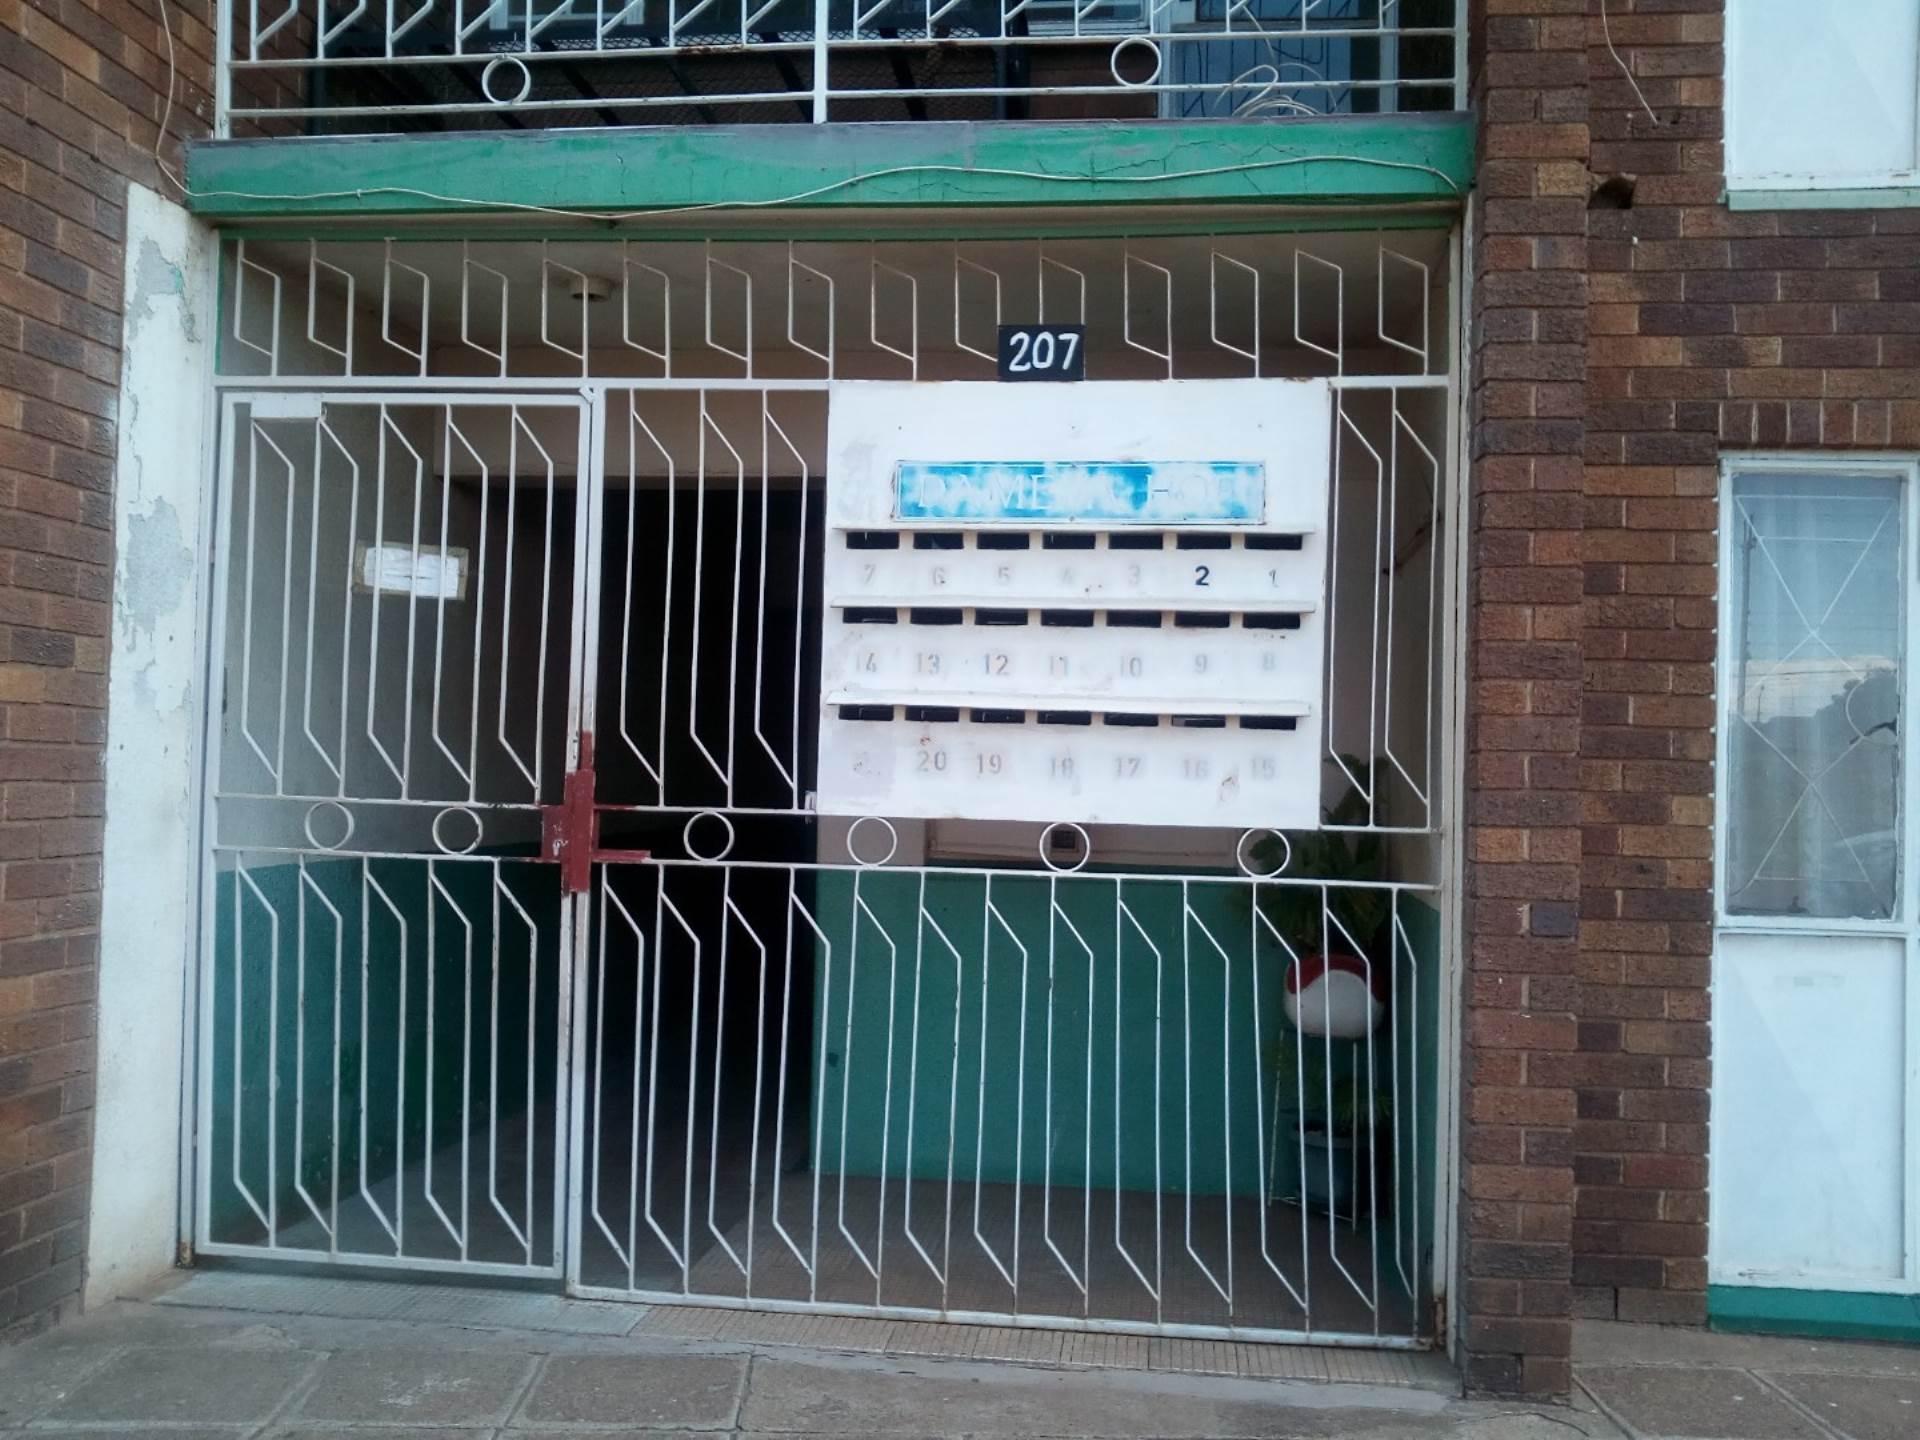 2 BedroomFlat To Rent In Lewisham Ext 3